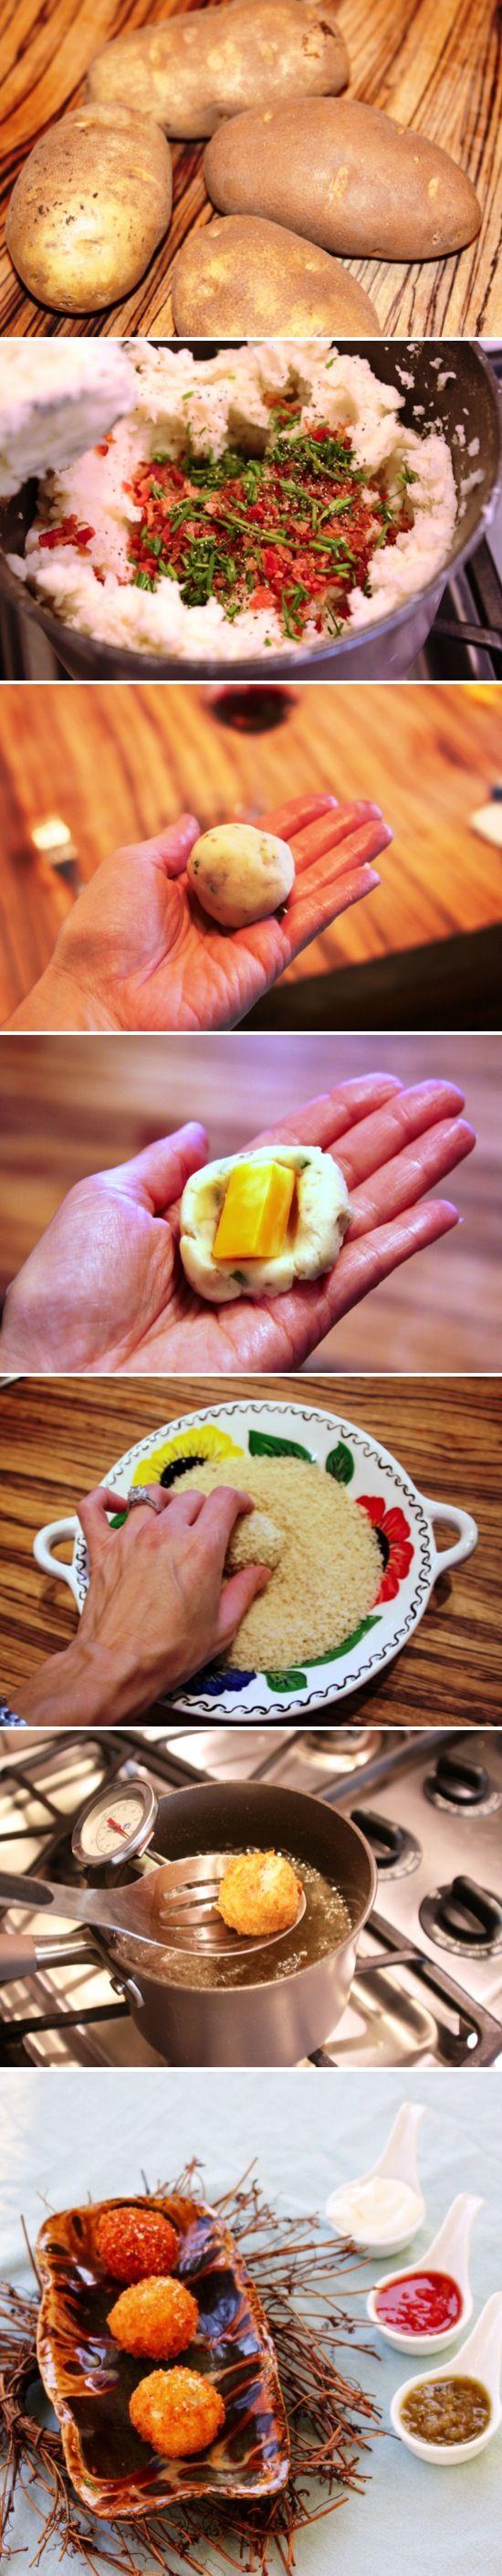 Loaded Baked Potato Balls